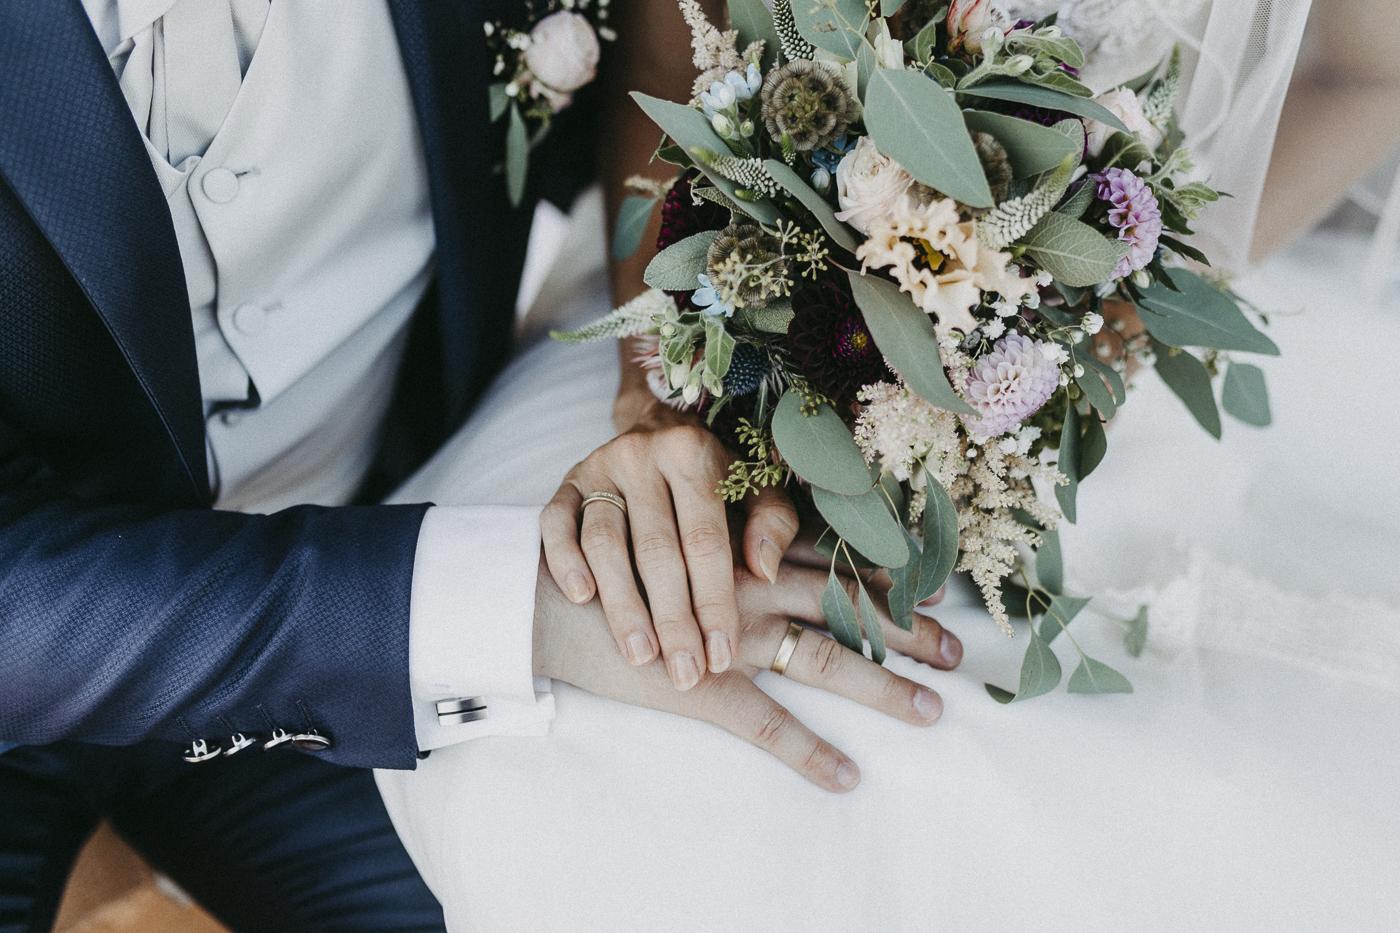 rosemarrylemon_ND_Hochzeit_Hochzeitsplanung7.jpg